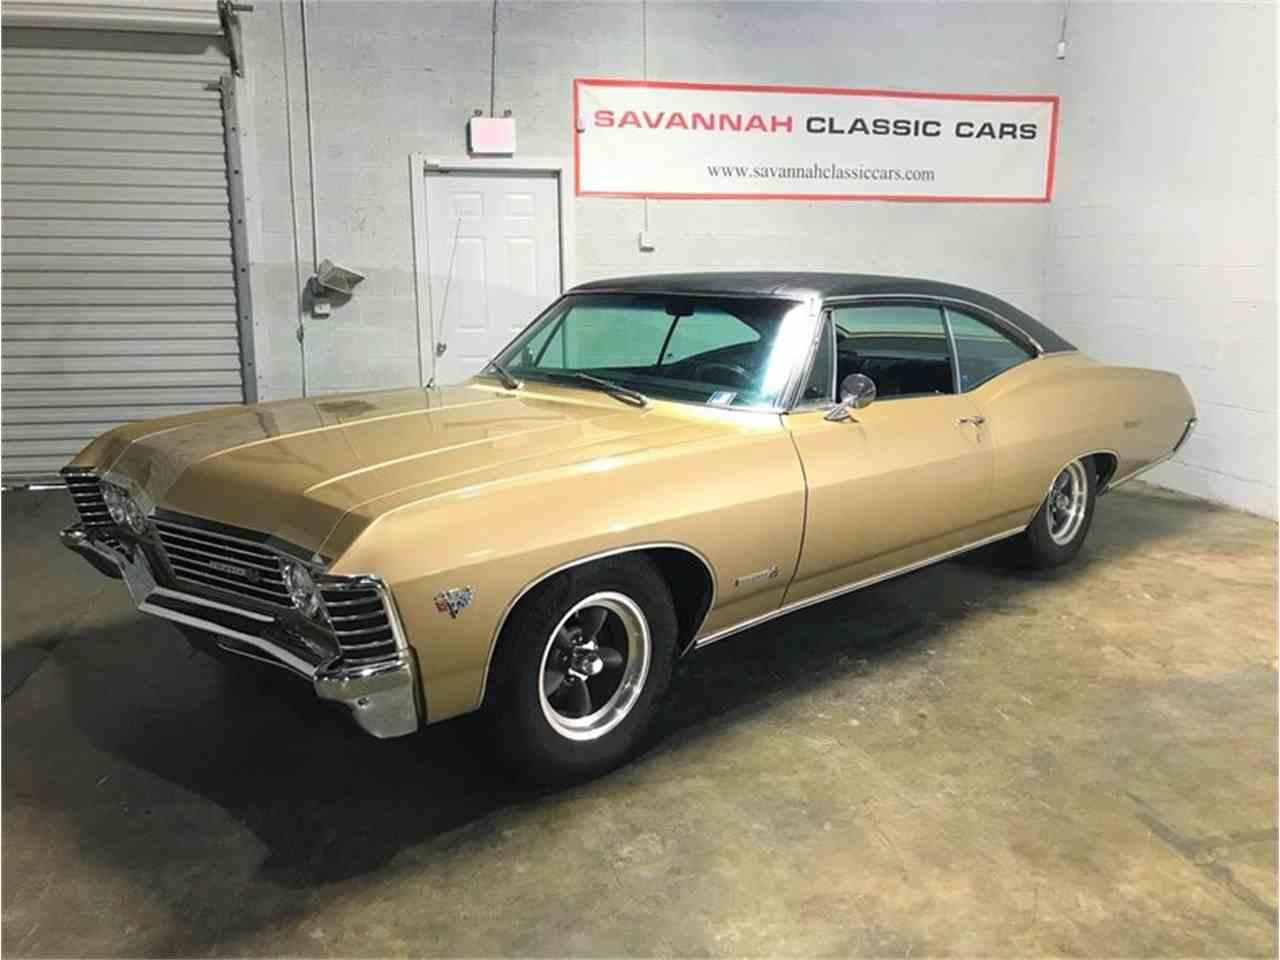 Cars For Sale Savannah Ga: 1967 Chevrolet Impala SS For Sale